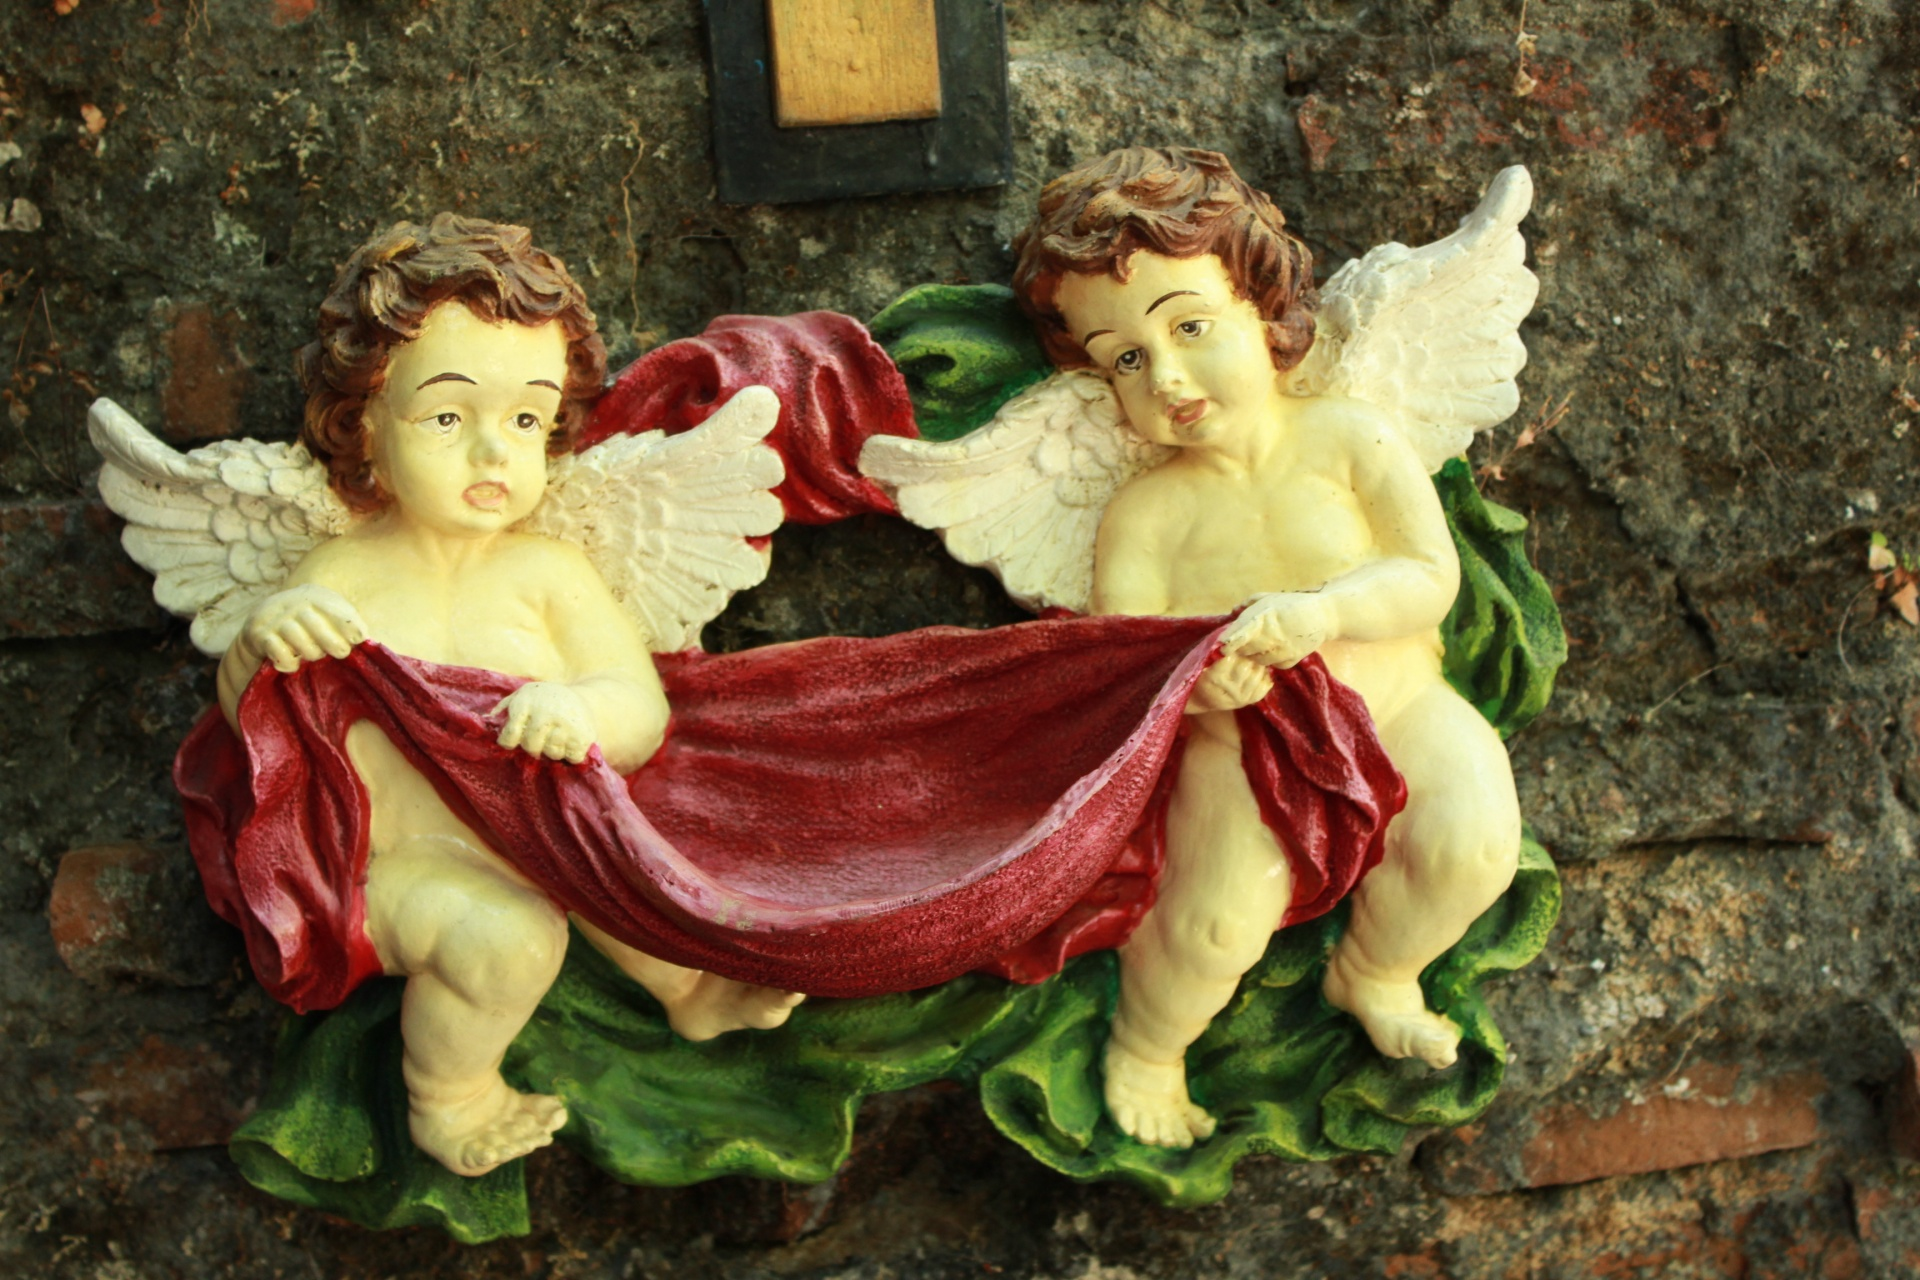 Angelsfigurinedecor,angels,figurine,decor,decorations ...